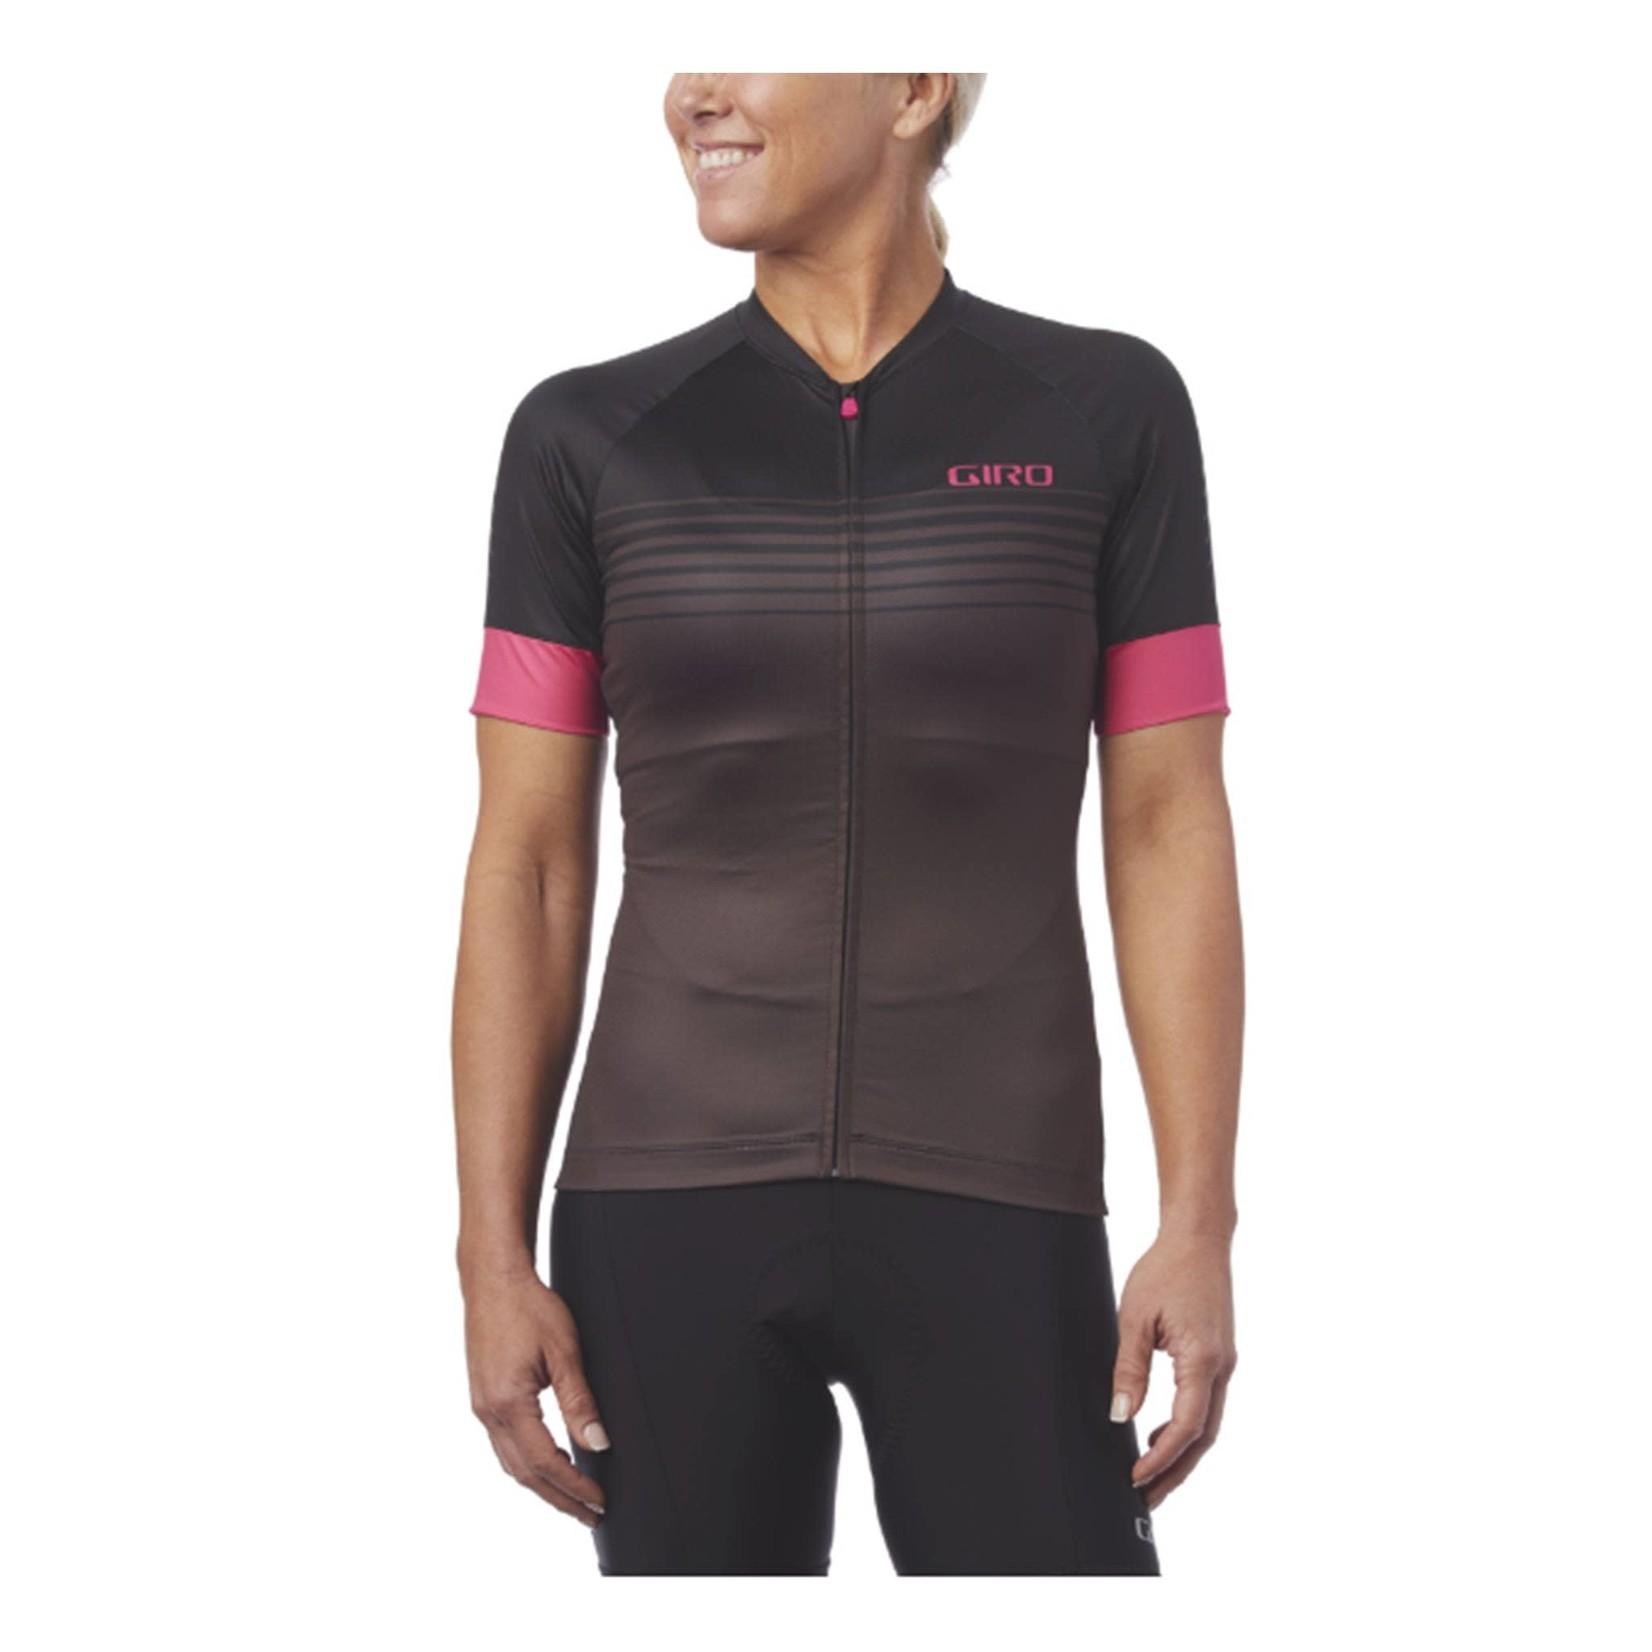 Giro Chrono Expert Womens Cycling Jersey Pink Black Stripe